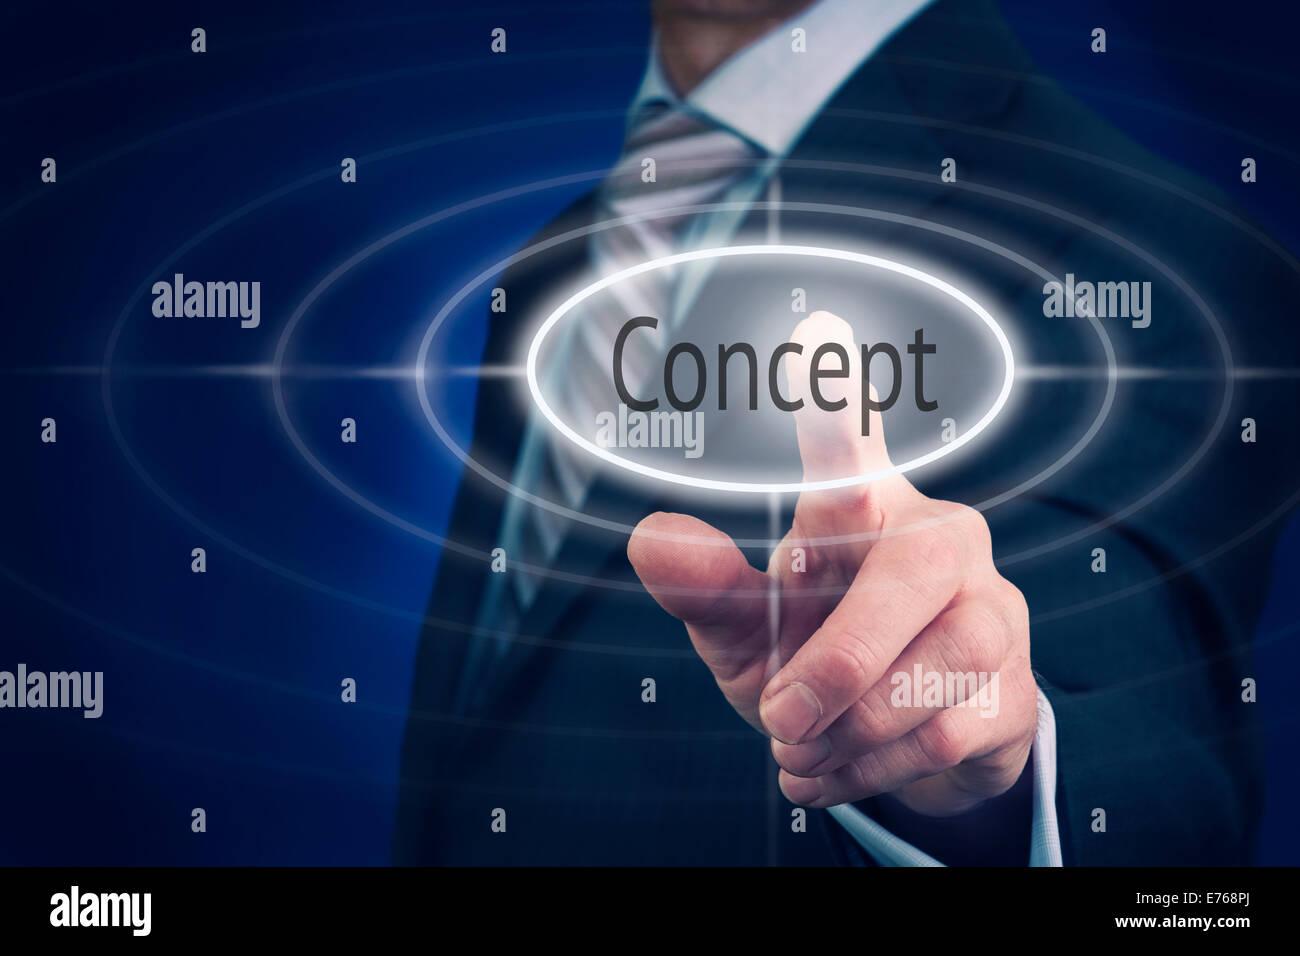 Businessman pressing a concept button. - Stock Image